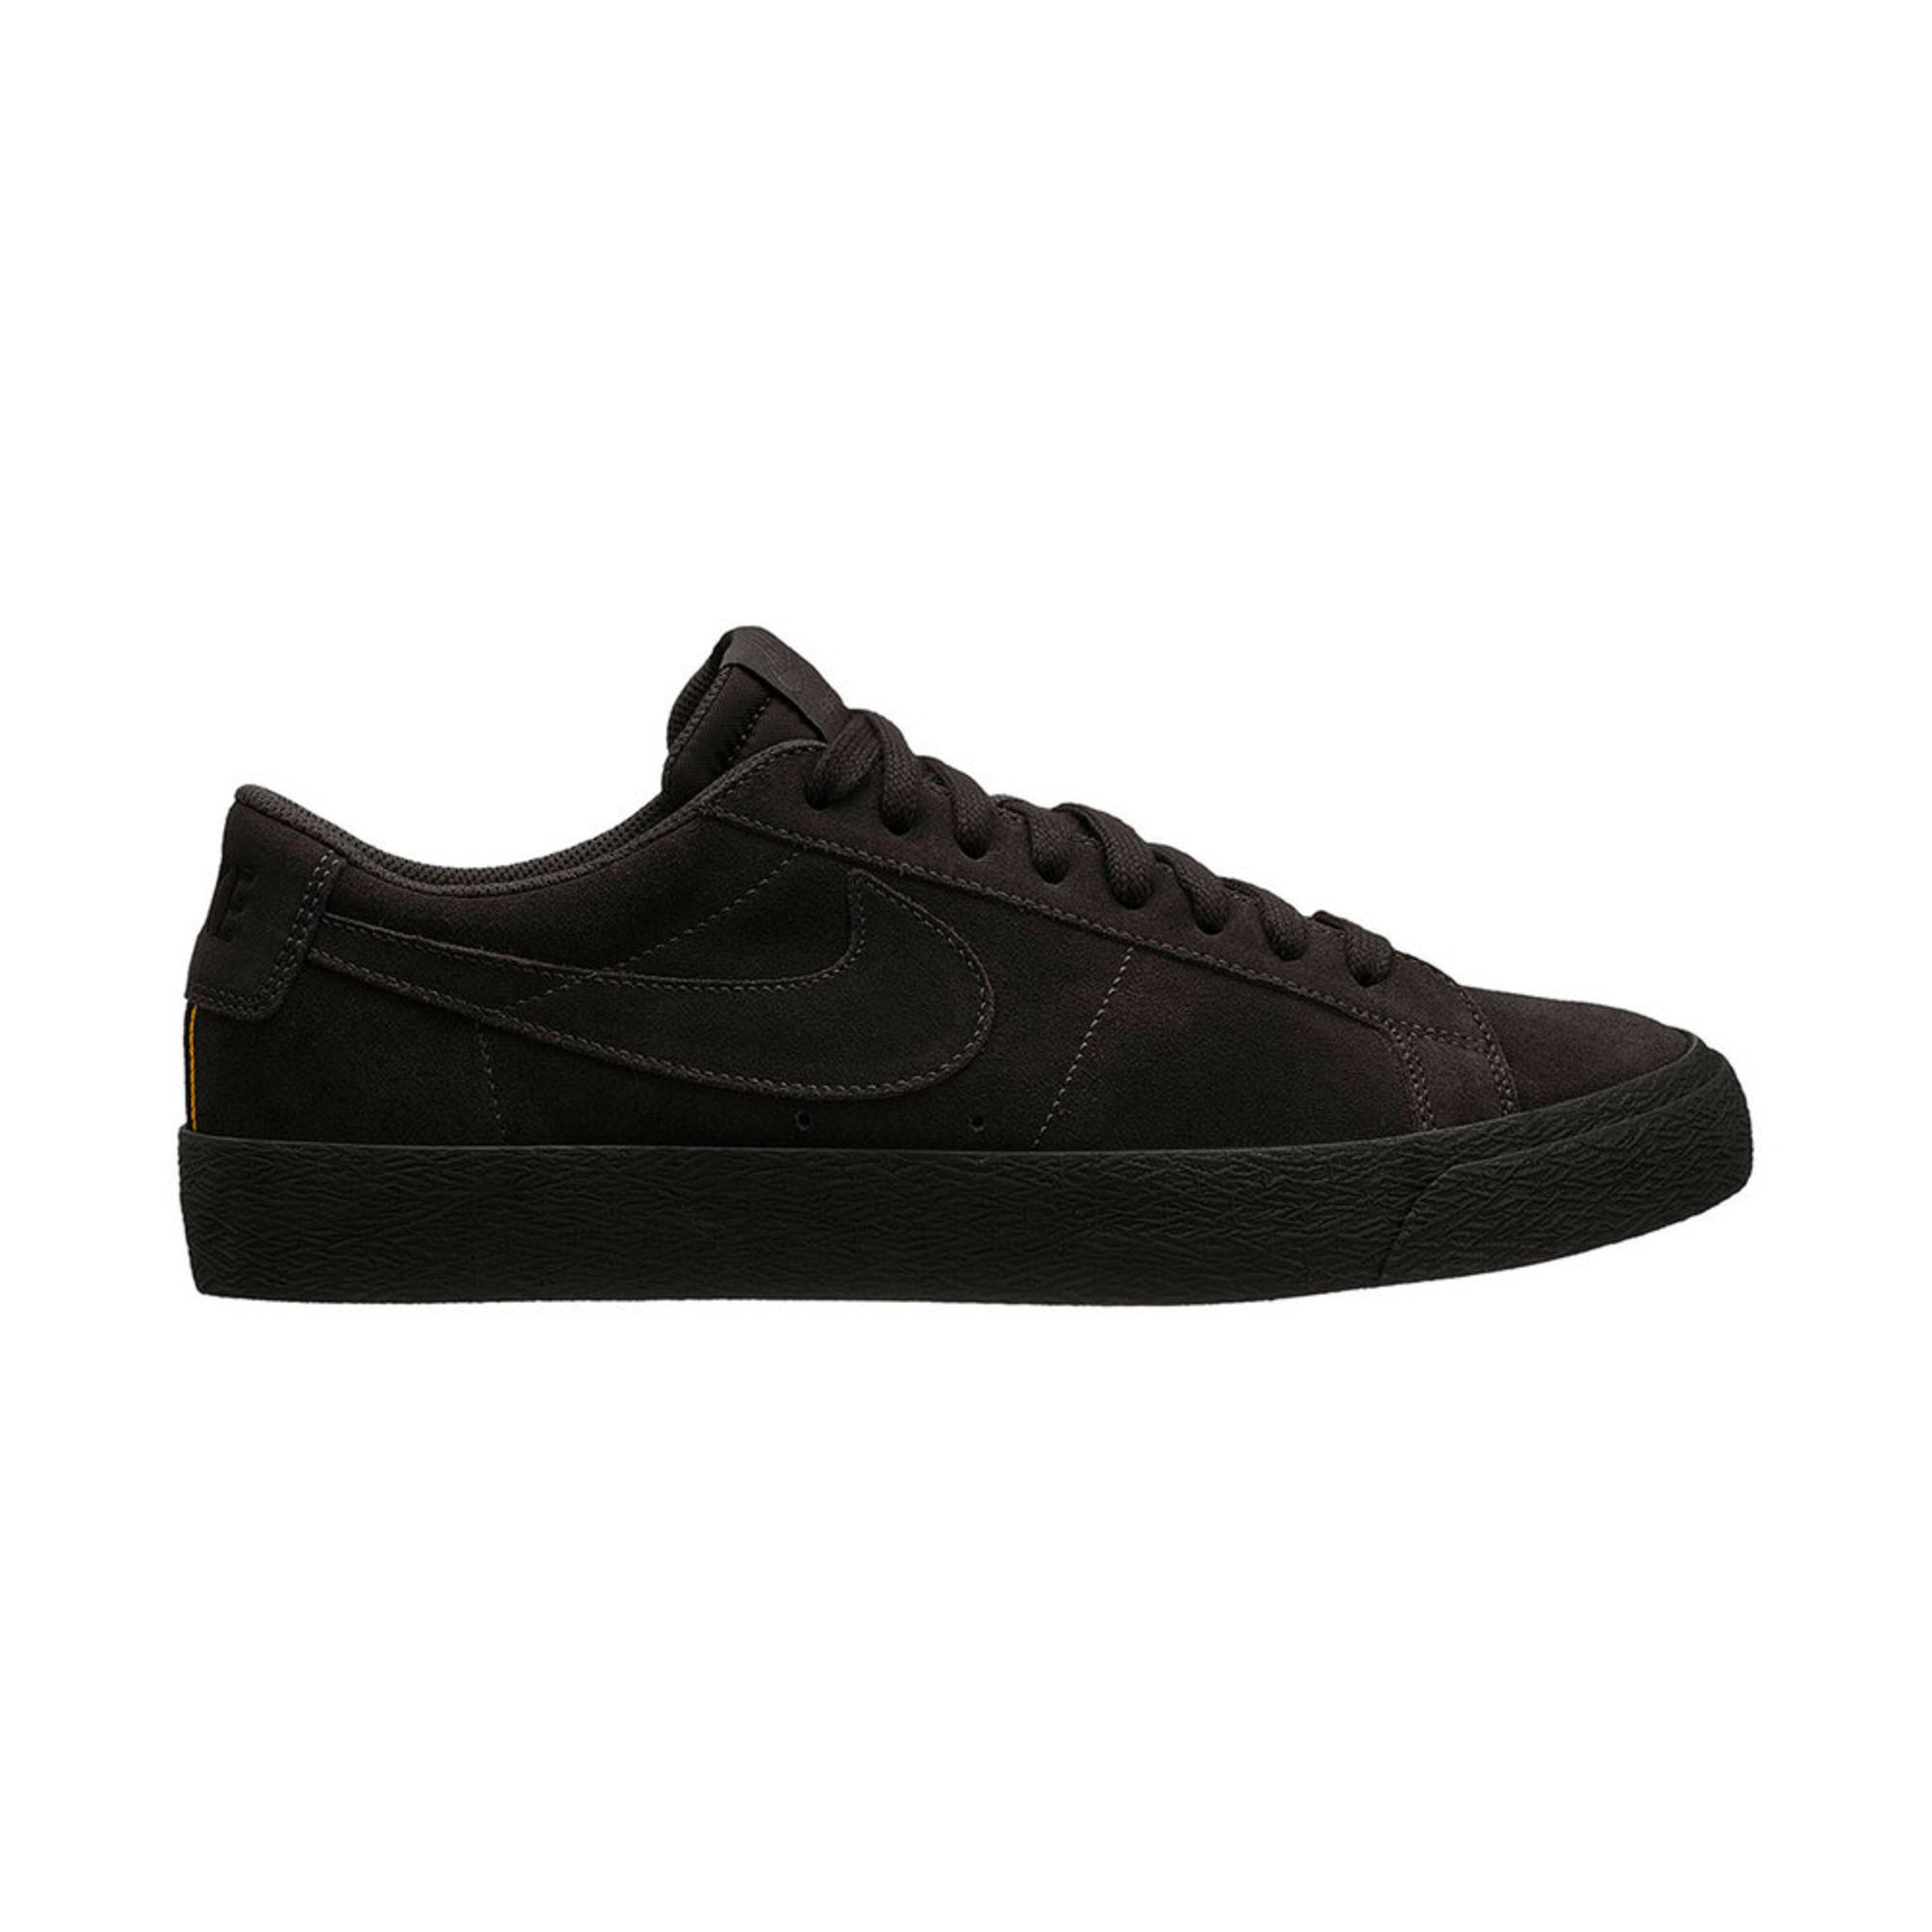 97dae532ea68 Nike SB. Nike SB Men s Zoom Blazer Low Skate Shoe